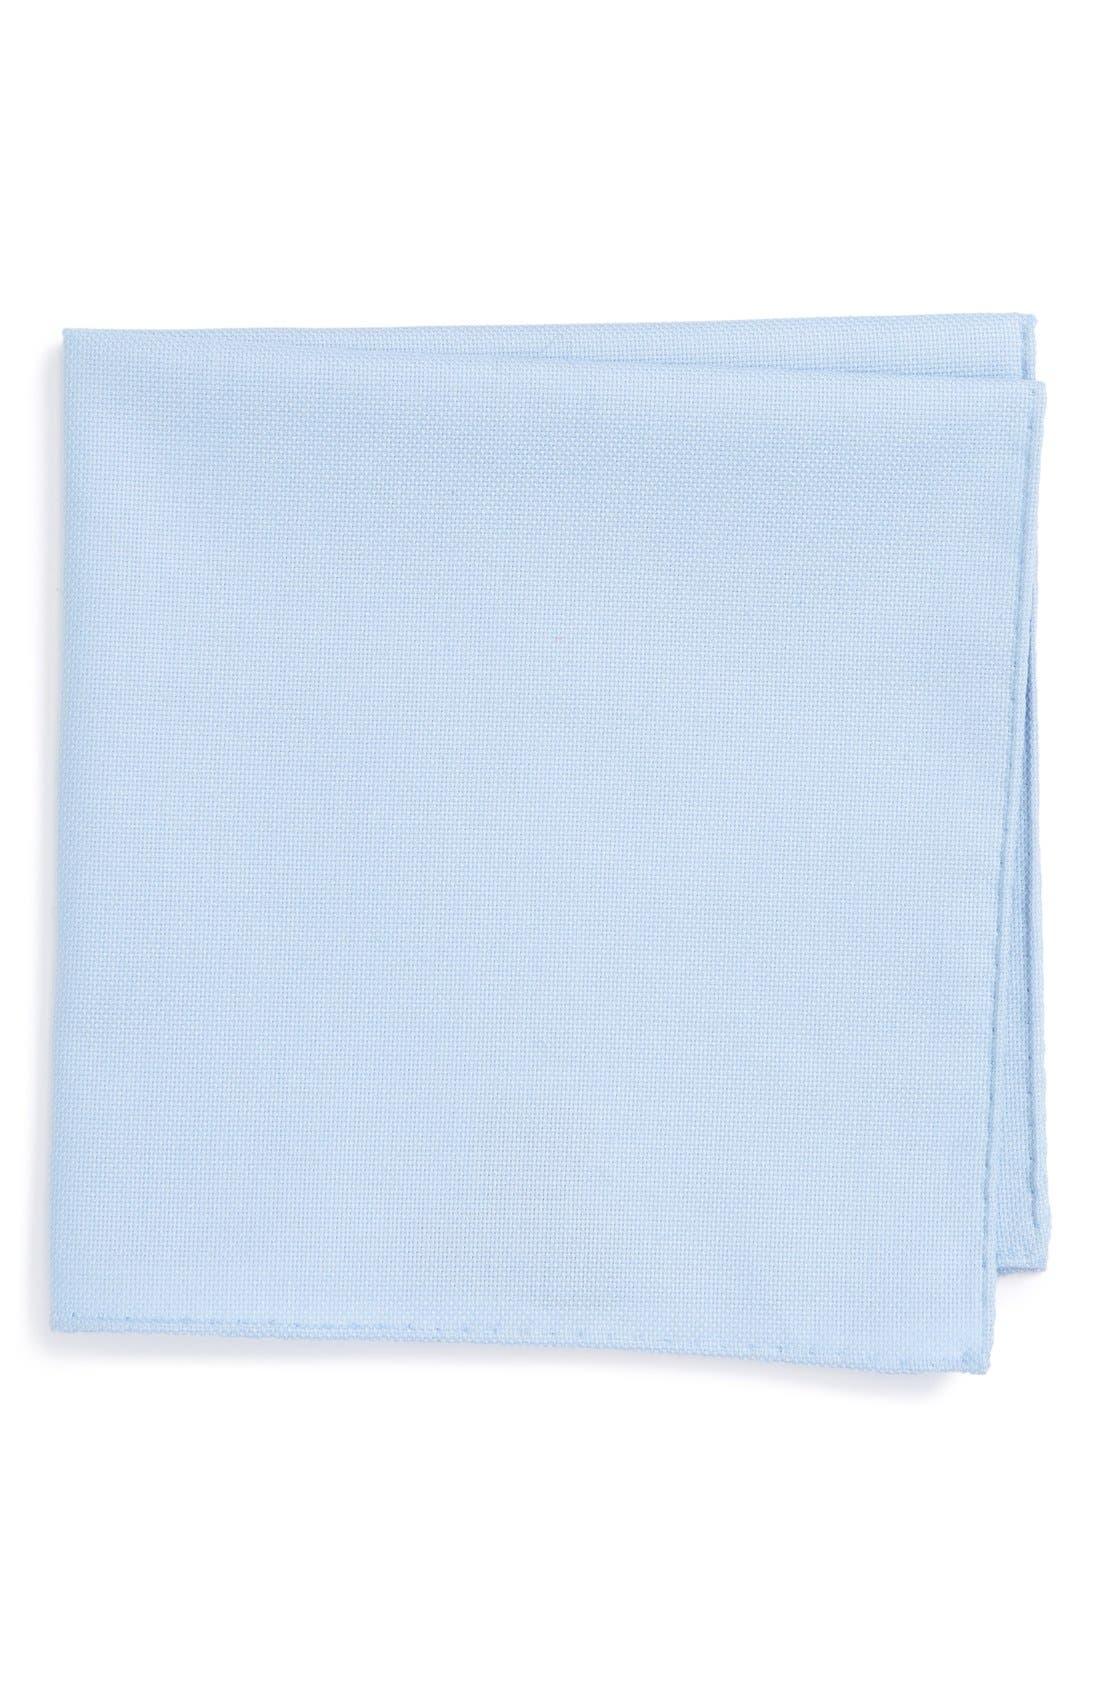 Alternate Image 1 Selected - Ted Baker London Solid Cotton Pocket Square